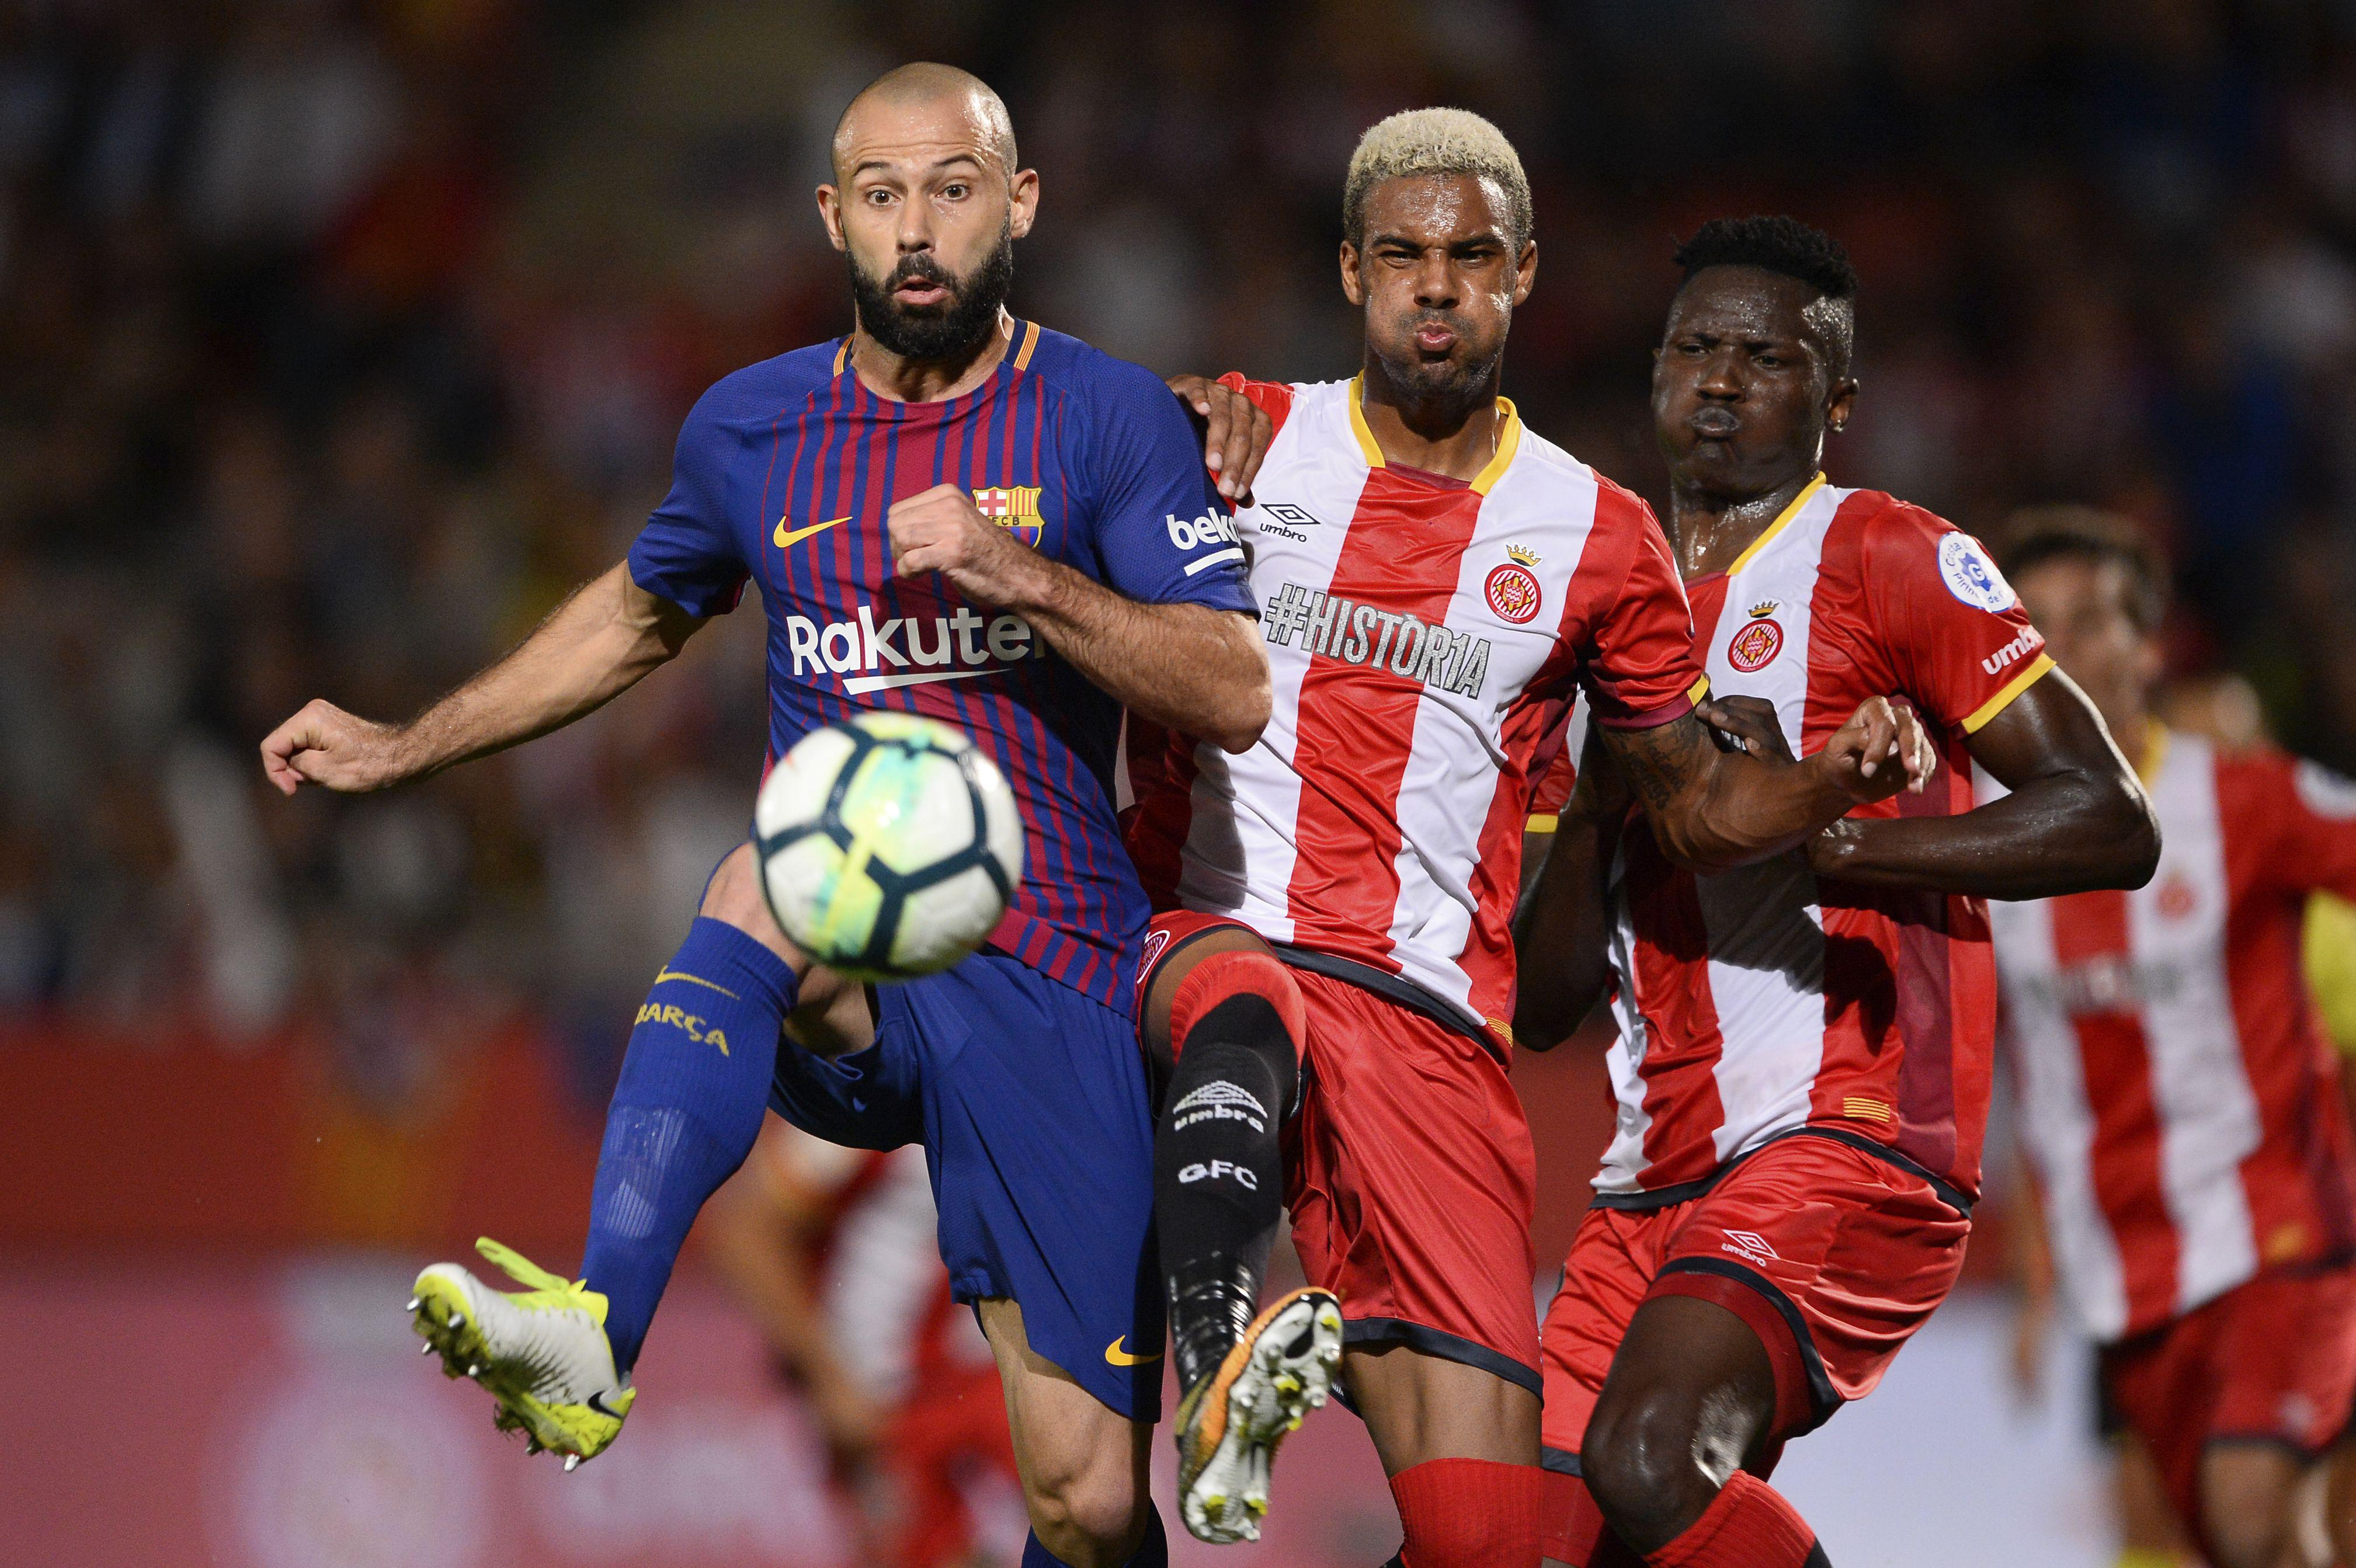 Mascherano has been a bit-part player for Barca this season